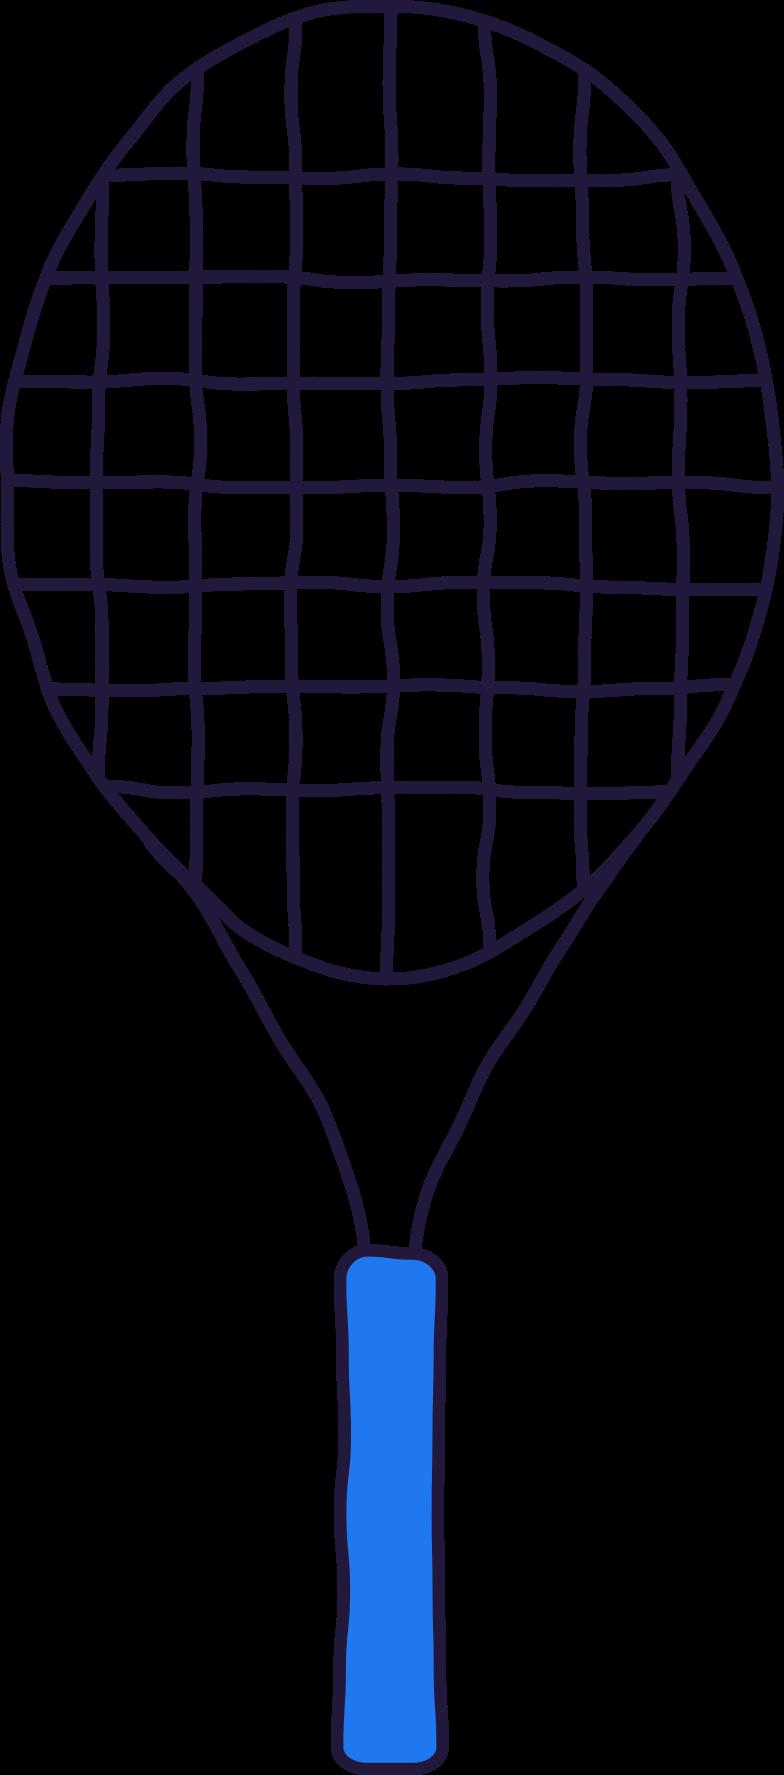 racket Clipart illustration in PNG, SVG